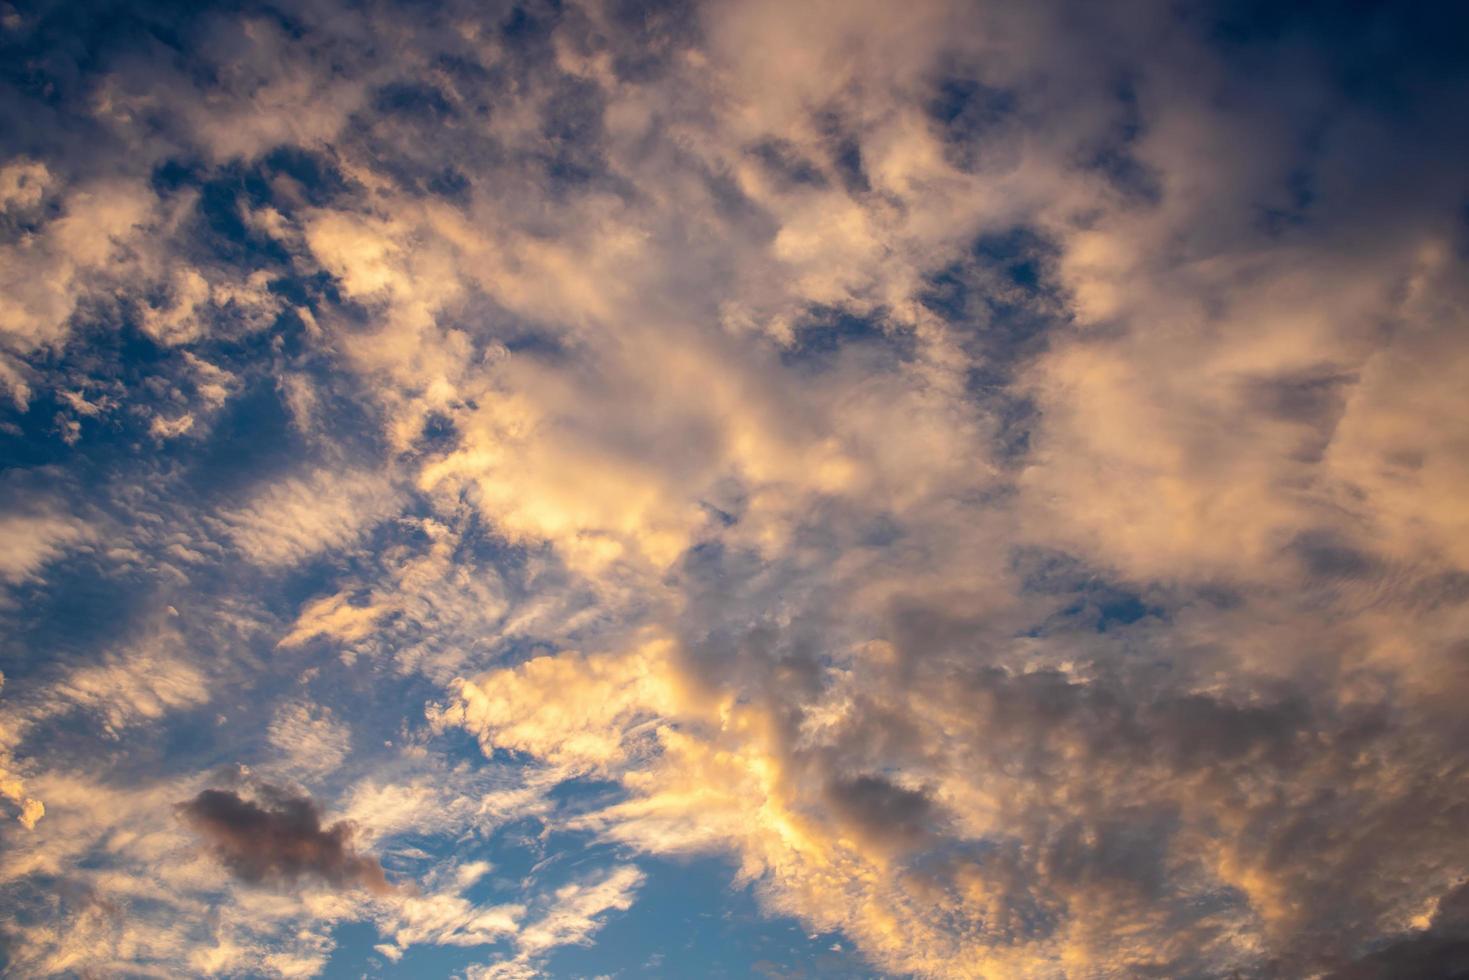 ciel heure d'or photo